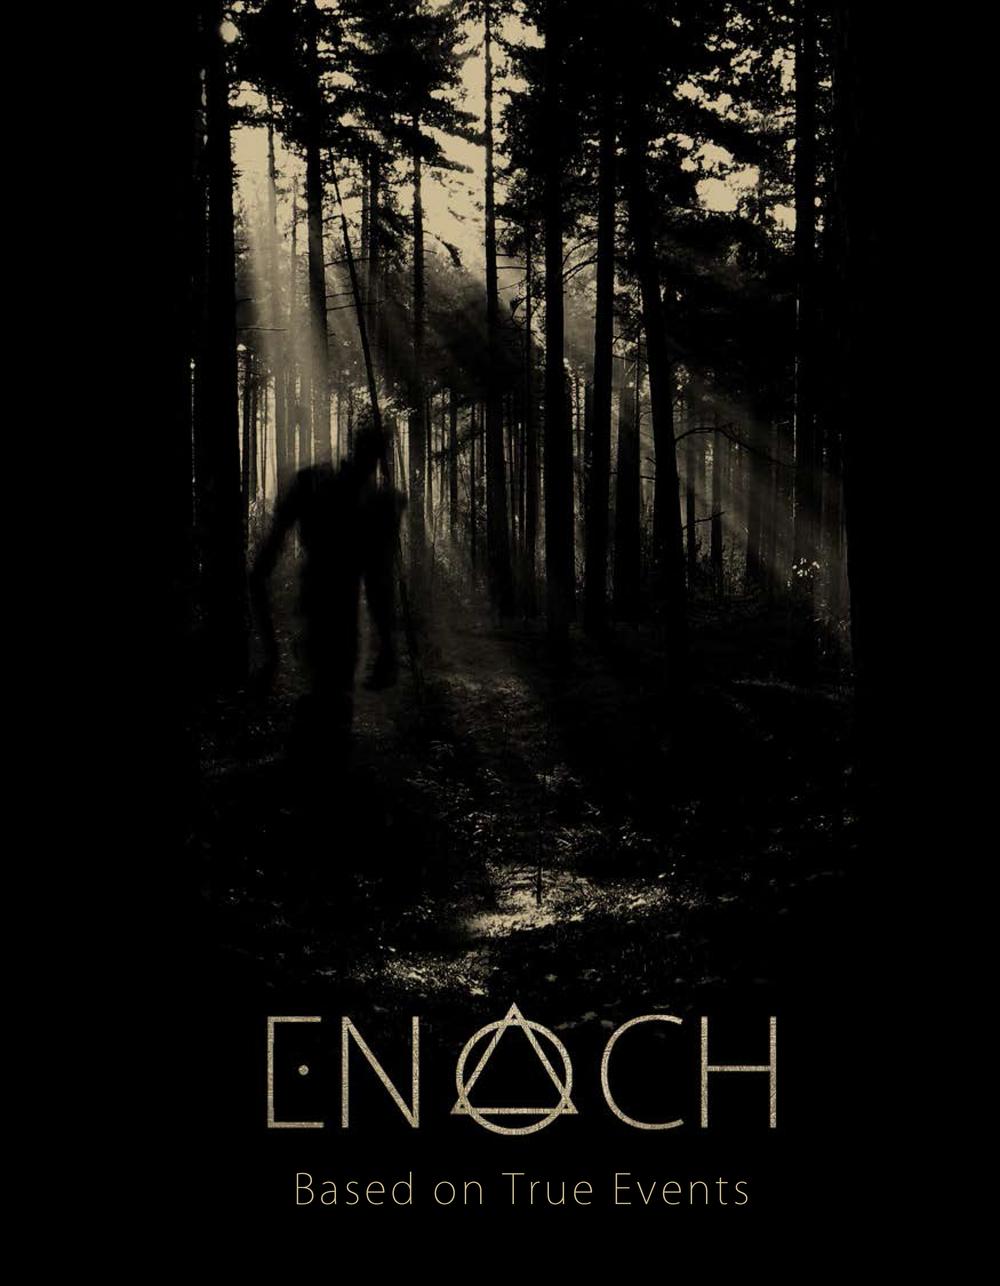 enoch_p1.jpg